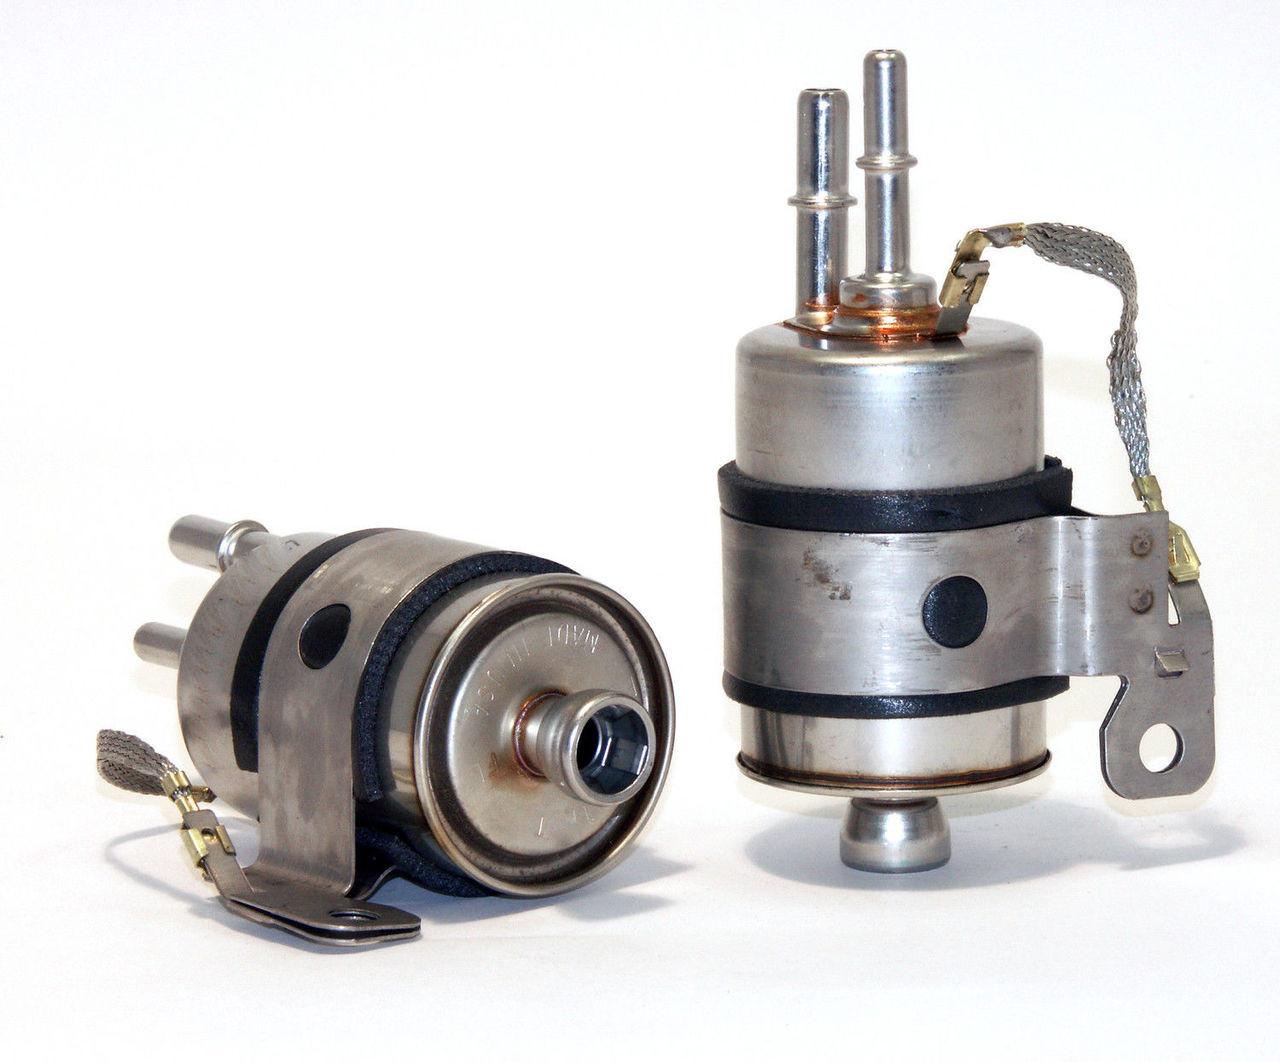 hight resolution of ls1 lsx engine swap wix fuel filter w built in regulator hawksls1 fuel filter 5